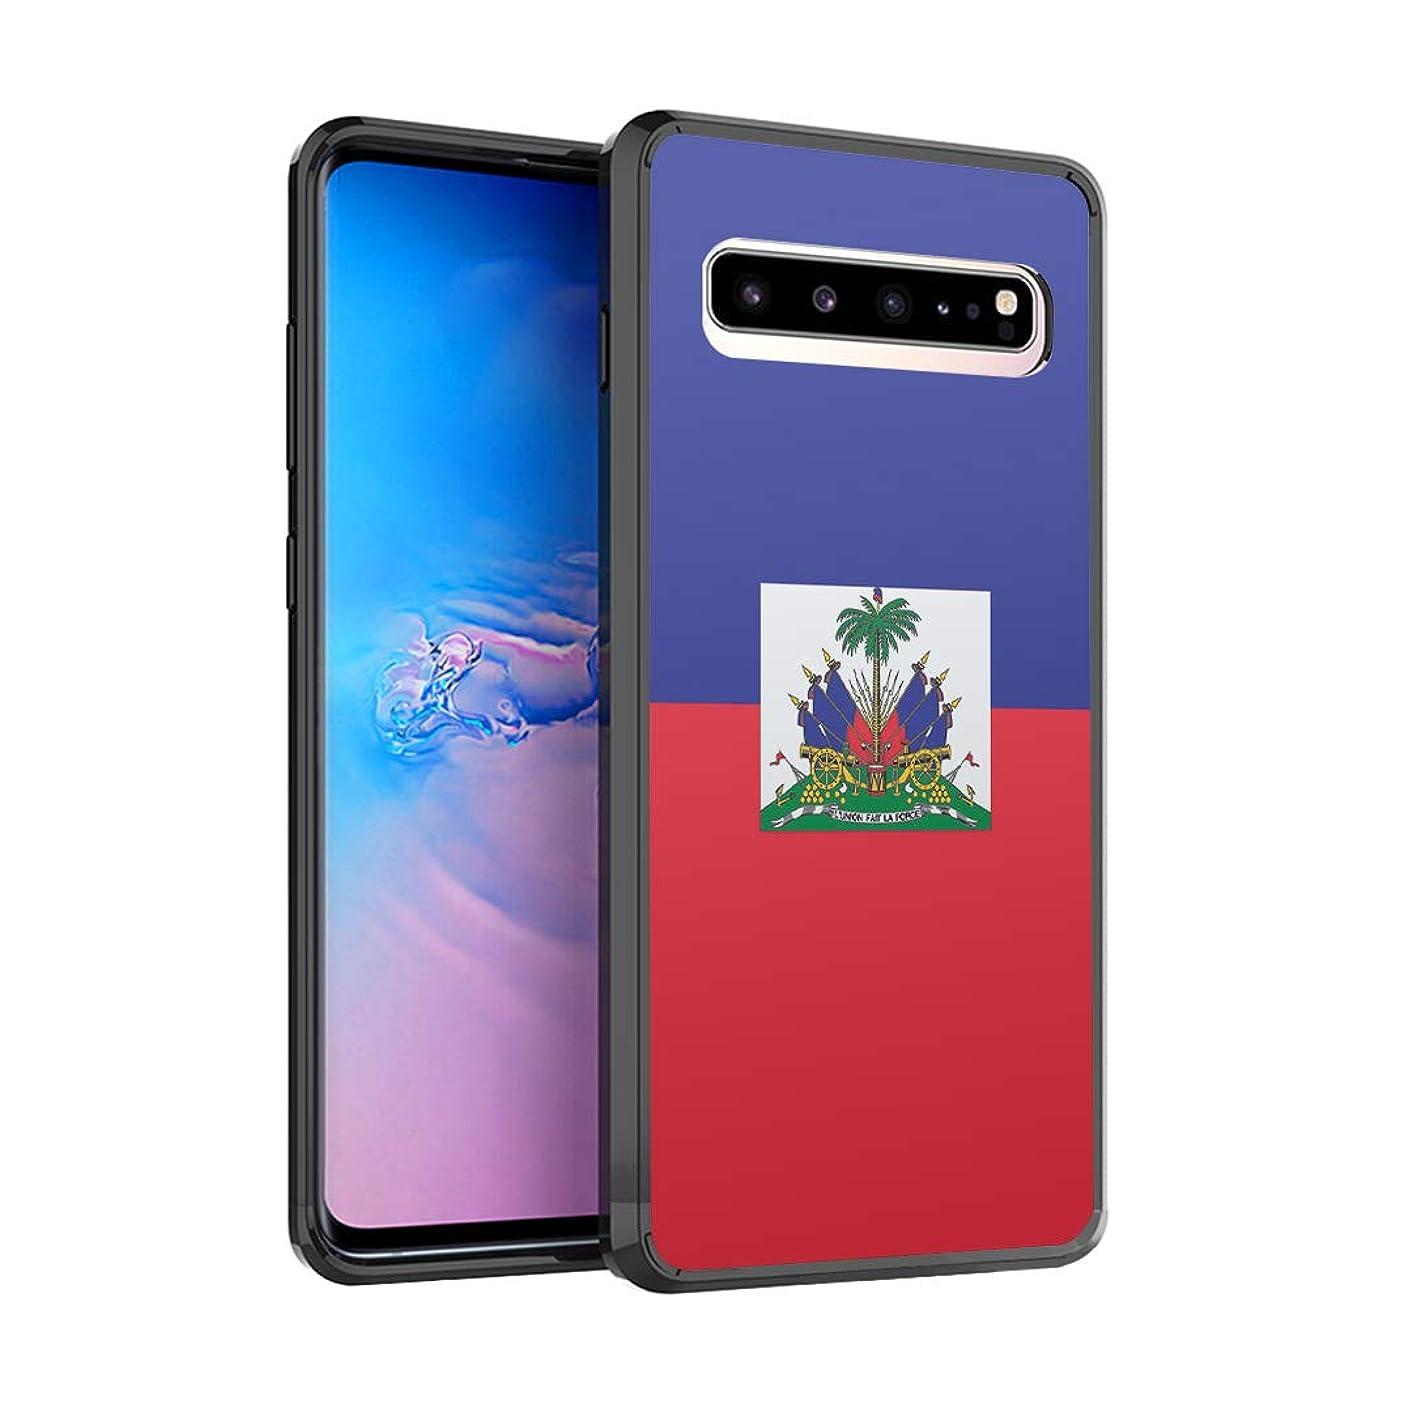 Moriko Case Compatible with Galaxy S10 5G [Drop Protection Slim Cushion Bumper Black Case] for Samsung Galaxy S 10 5G (2019) - (Haiti Flag)